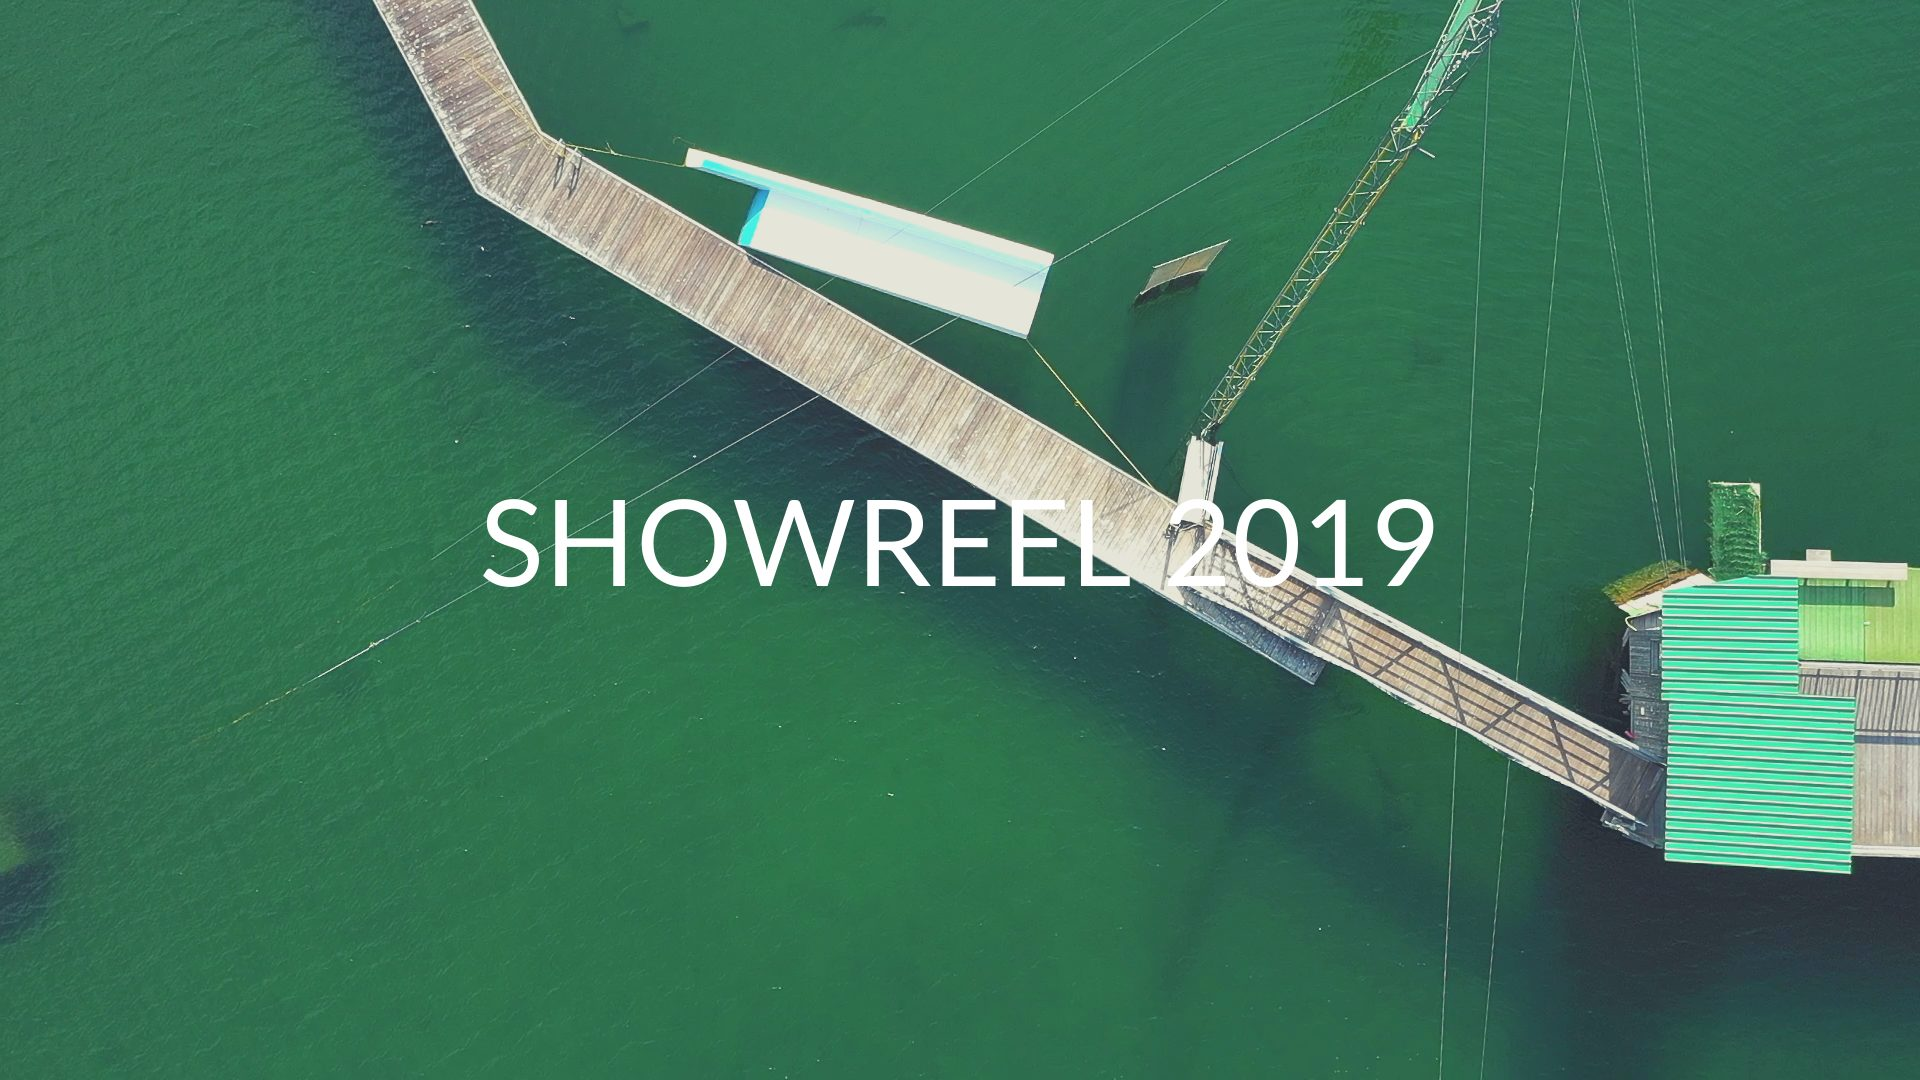 SHOWREEL 2019 copie